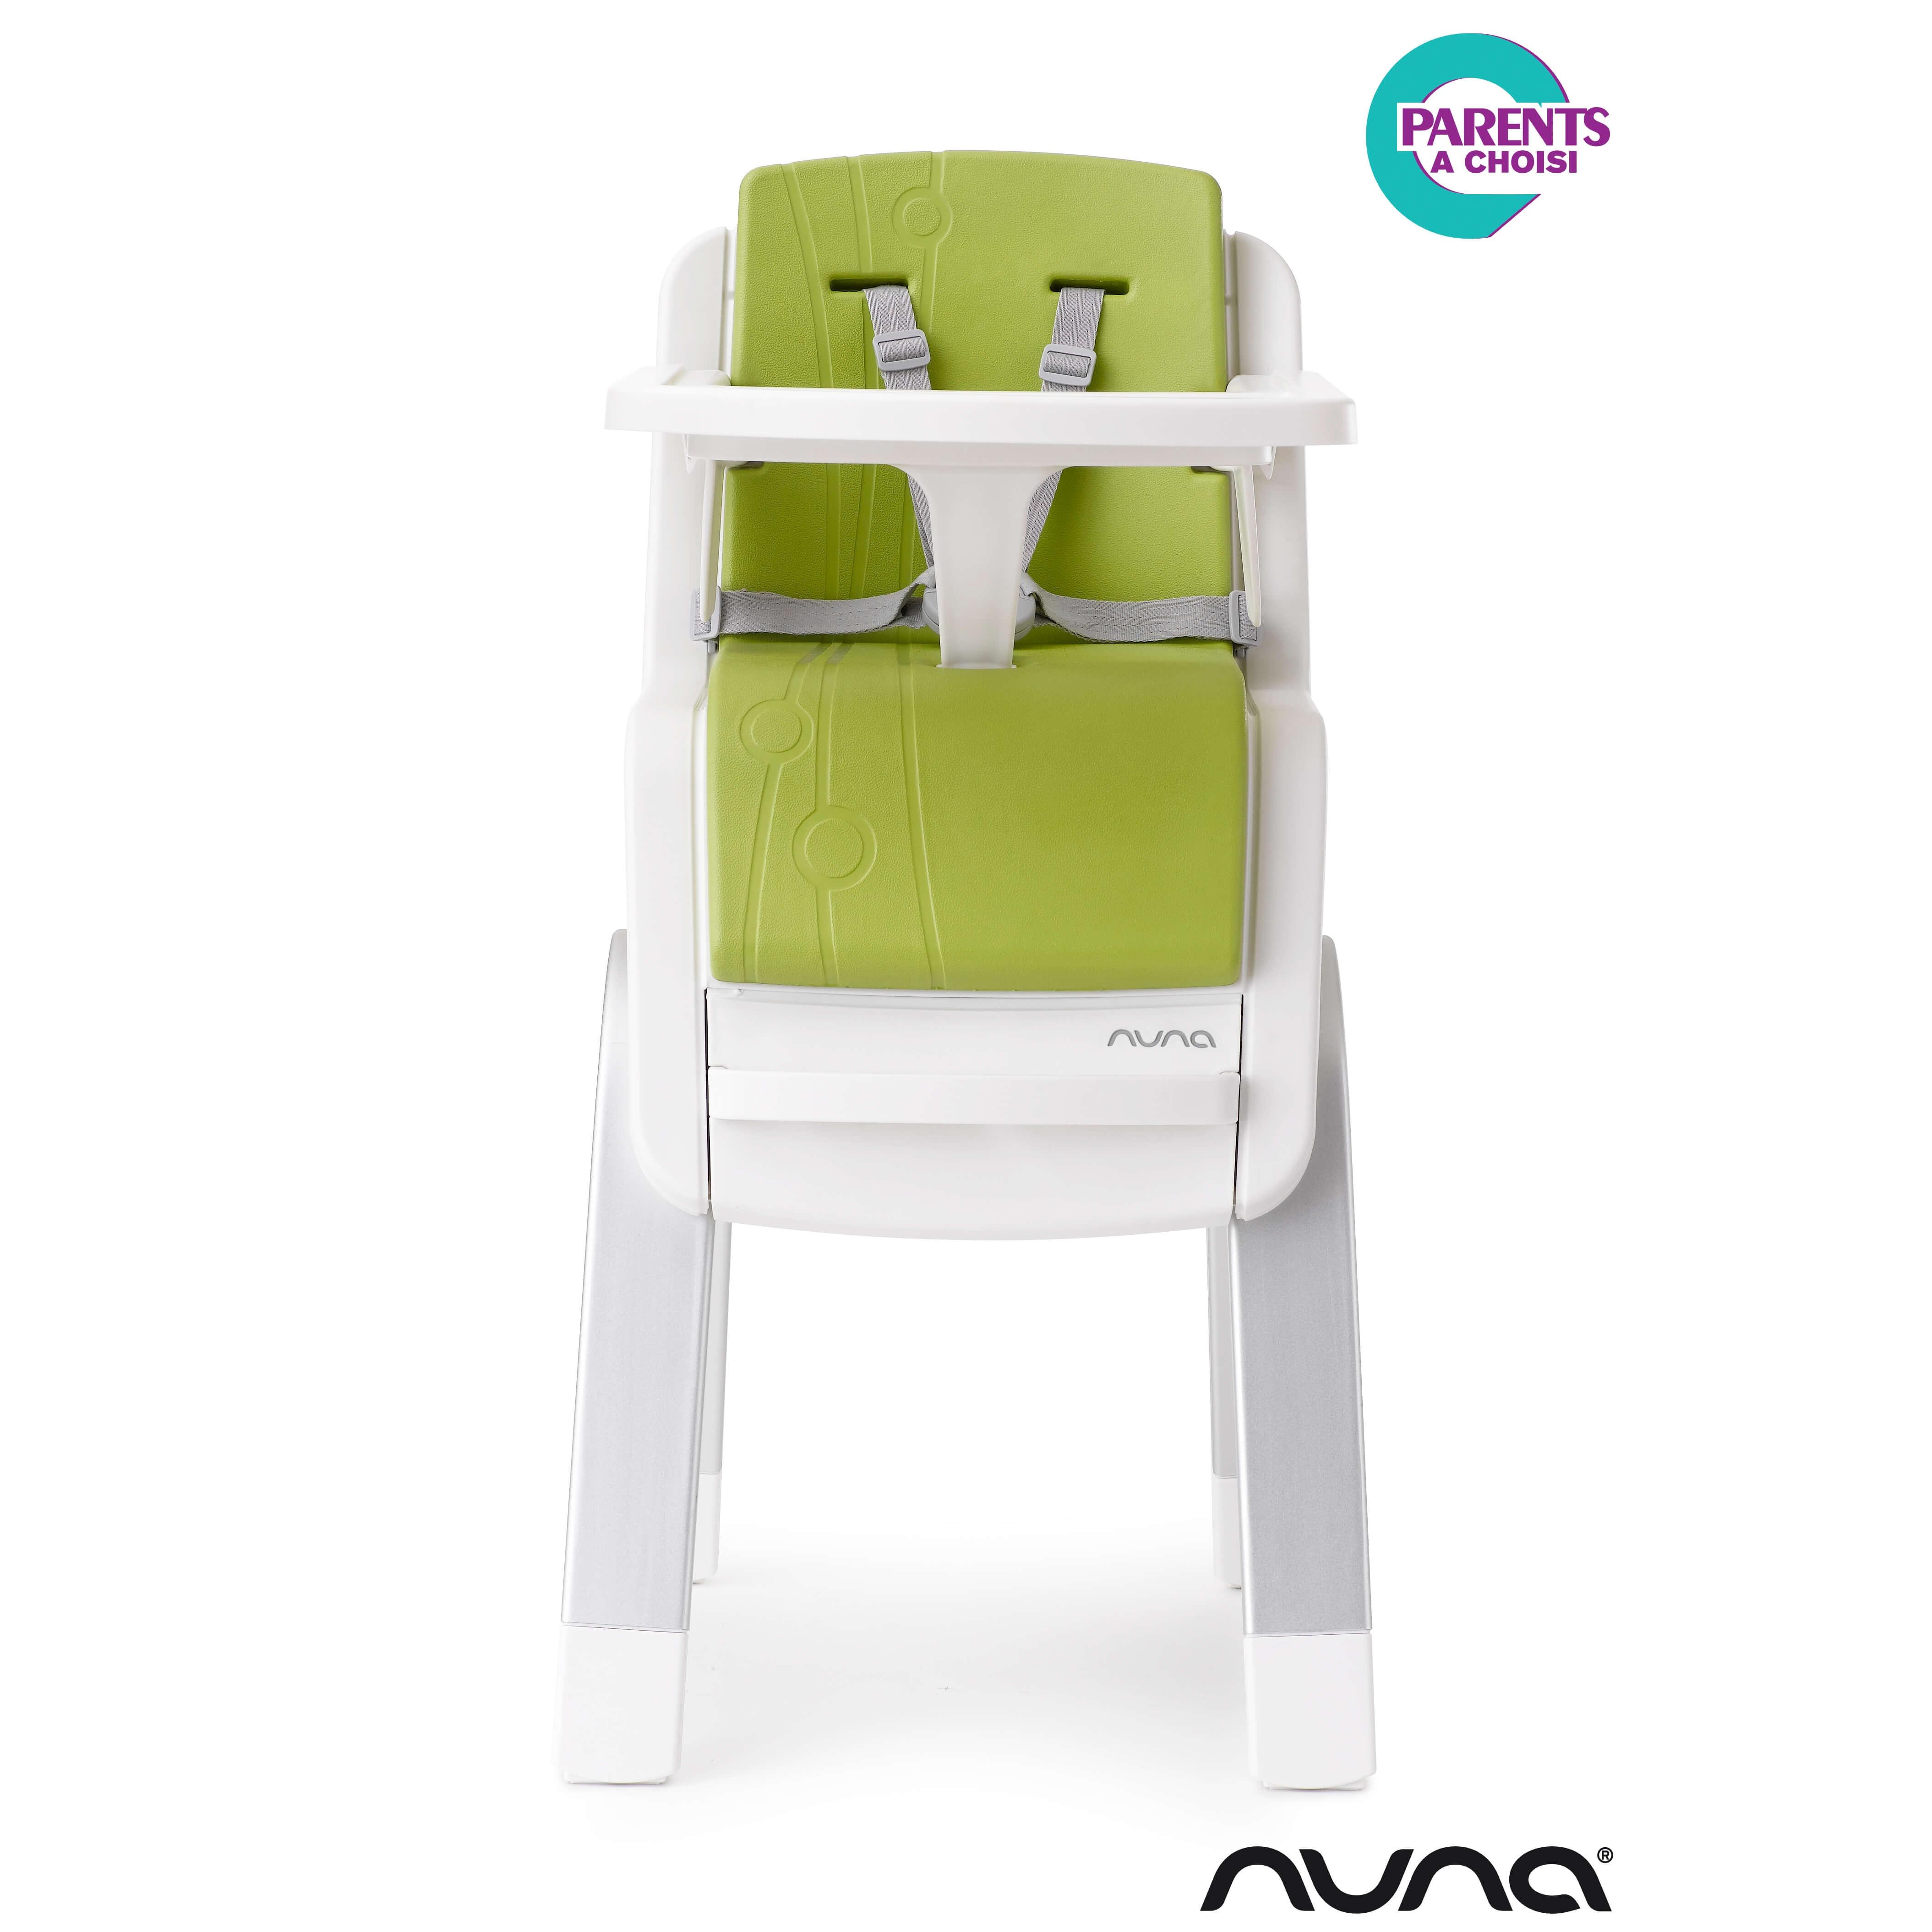 nuna chaise haute zaaz de nuna coloris citron vert made in b b. Black Bedroom Furniture Sets. Home Design Ideas